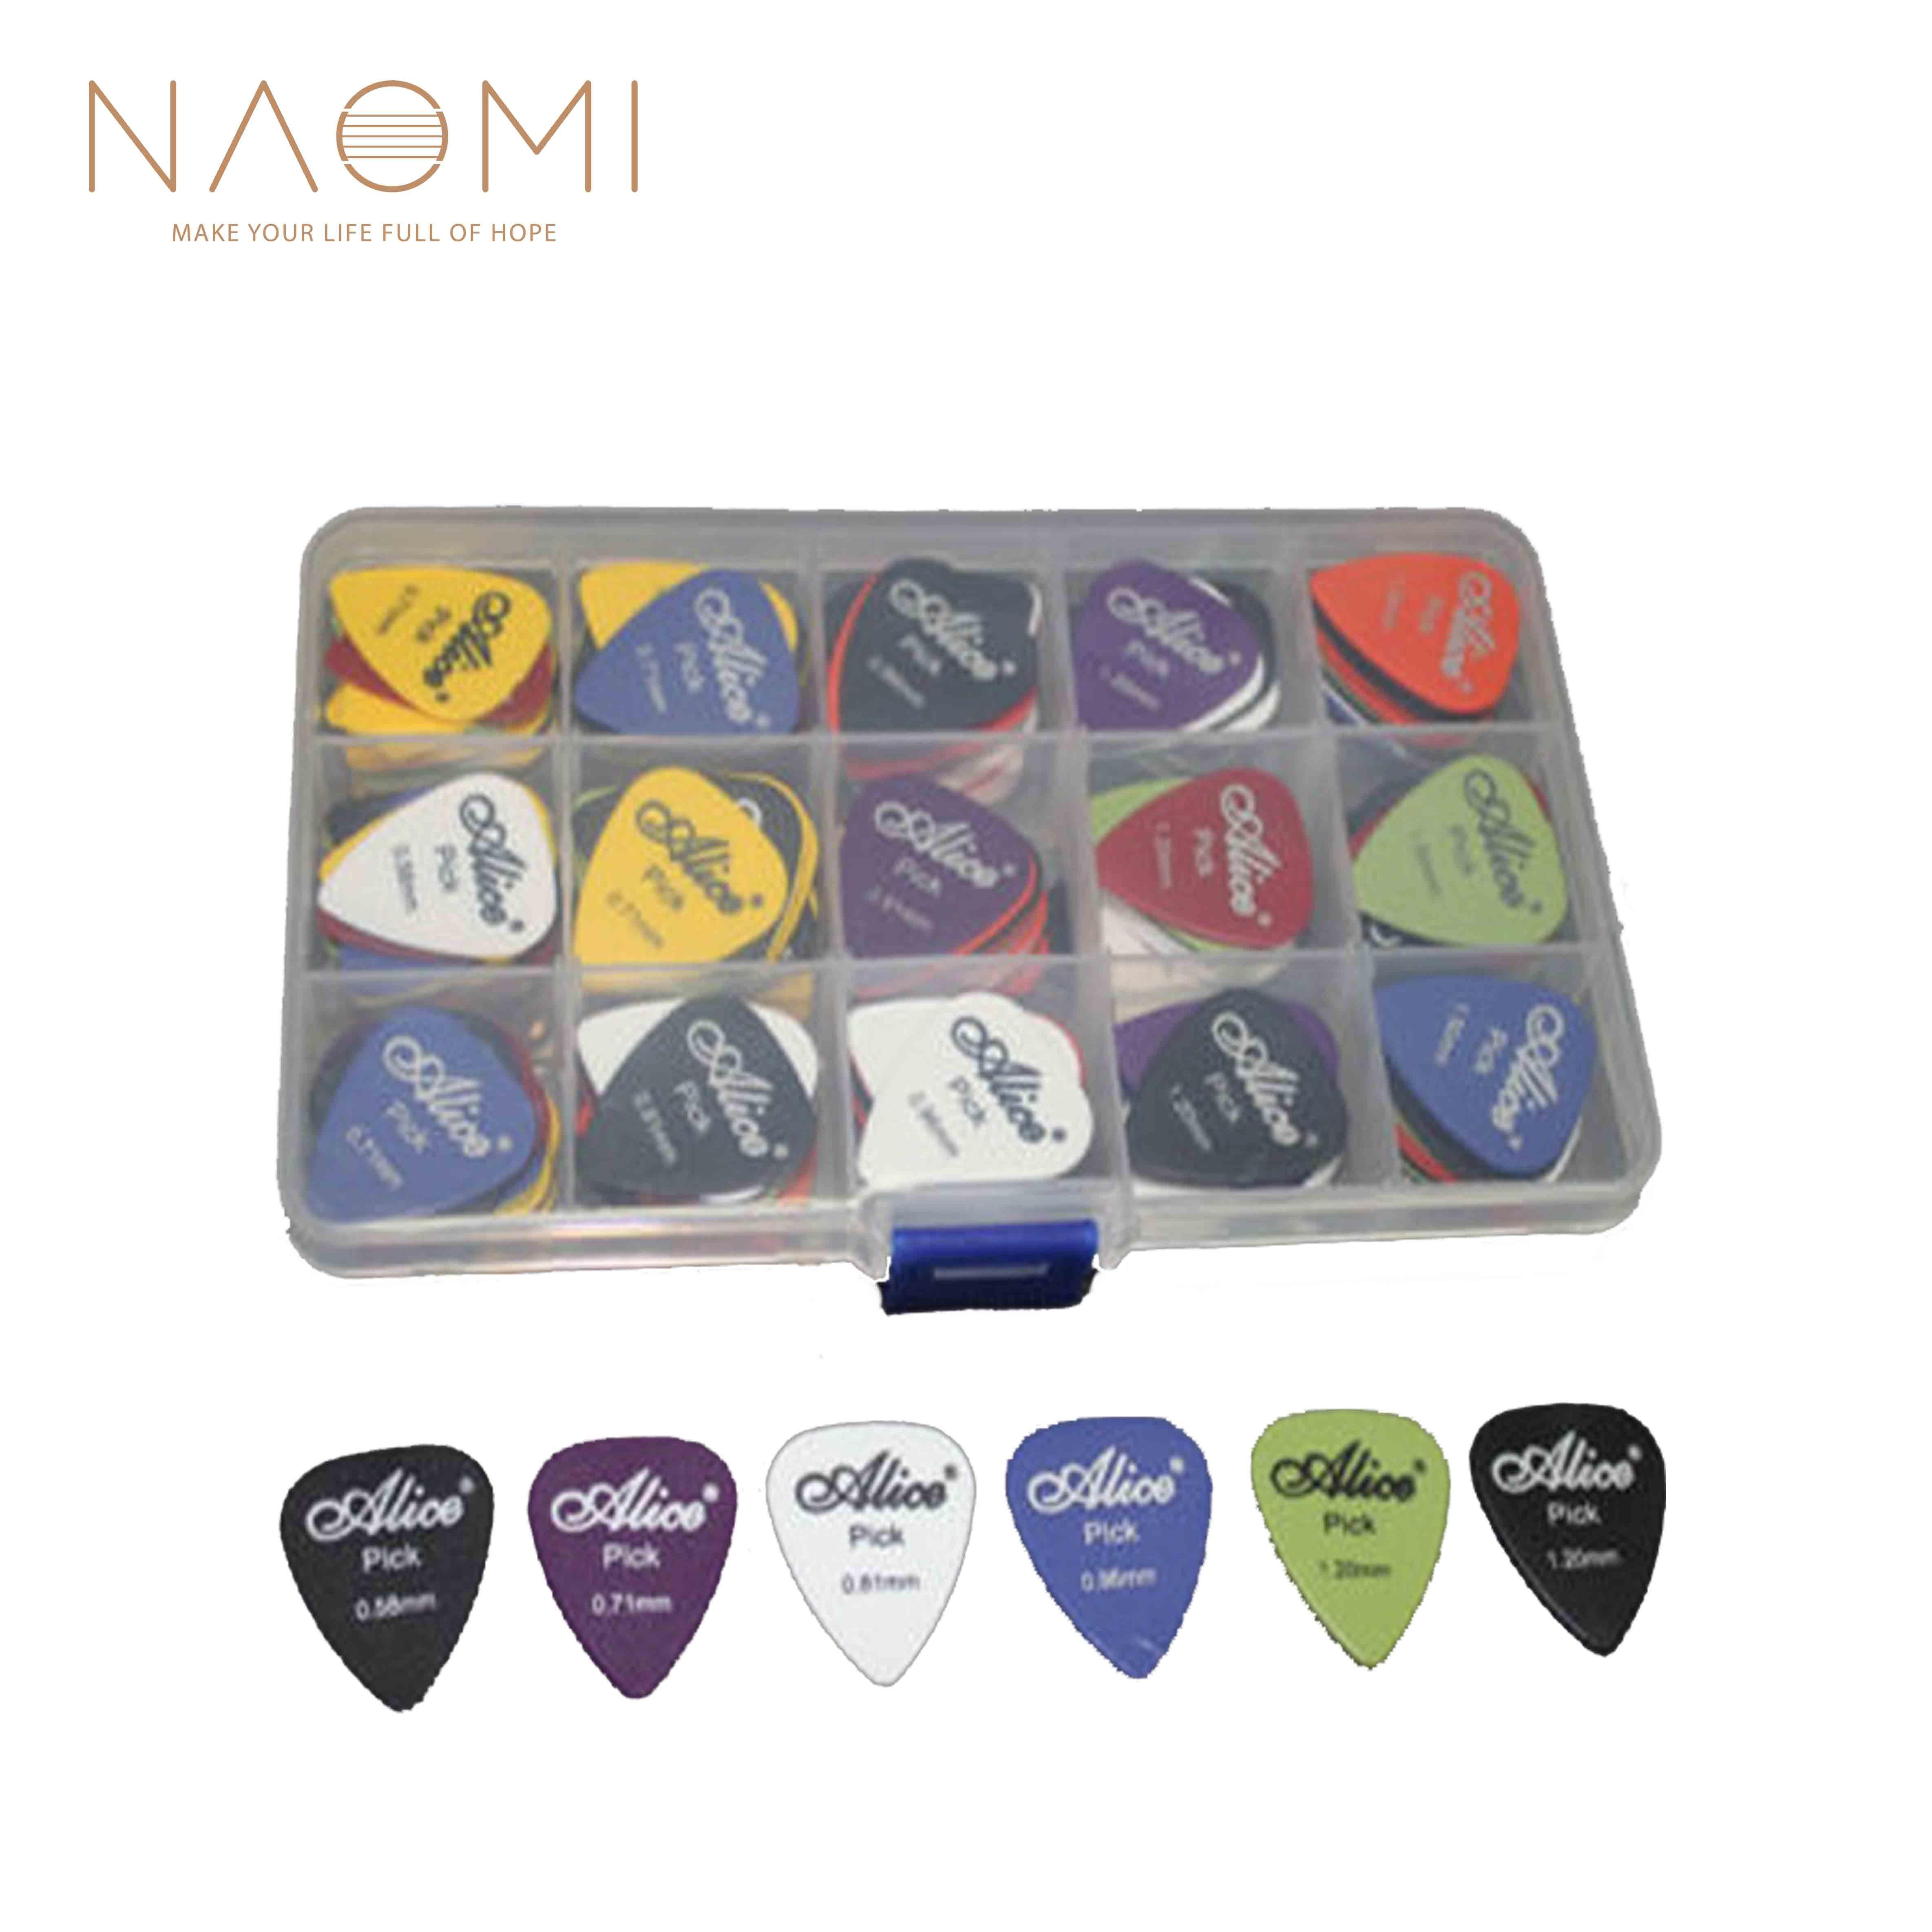 NAOMI Guitar Picks 100pcs Acoustic Electric Guitar Picks Plectrum Various 6 Thickness + Pick Box Guitar Parts Accessories New